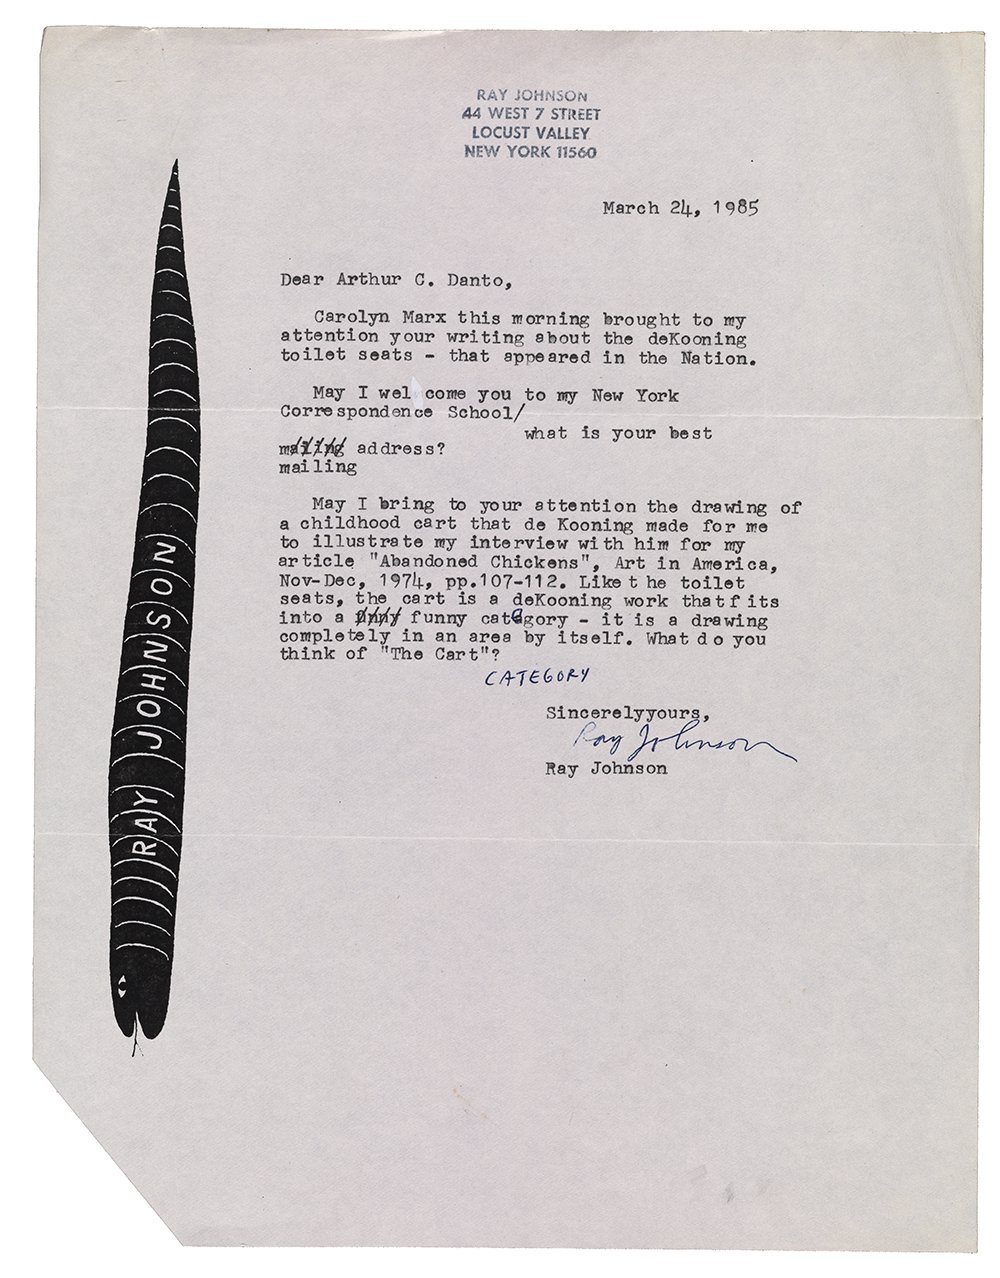 Letter sent to Arthur C. Danto by Ray Johnson